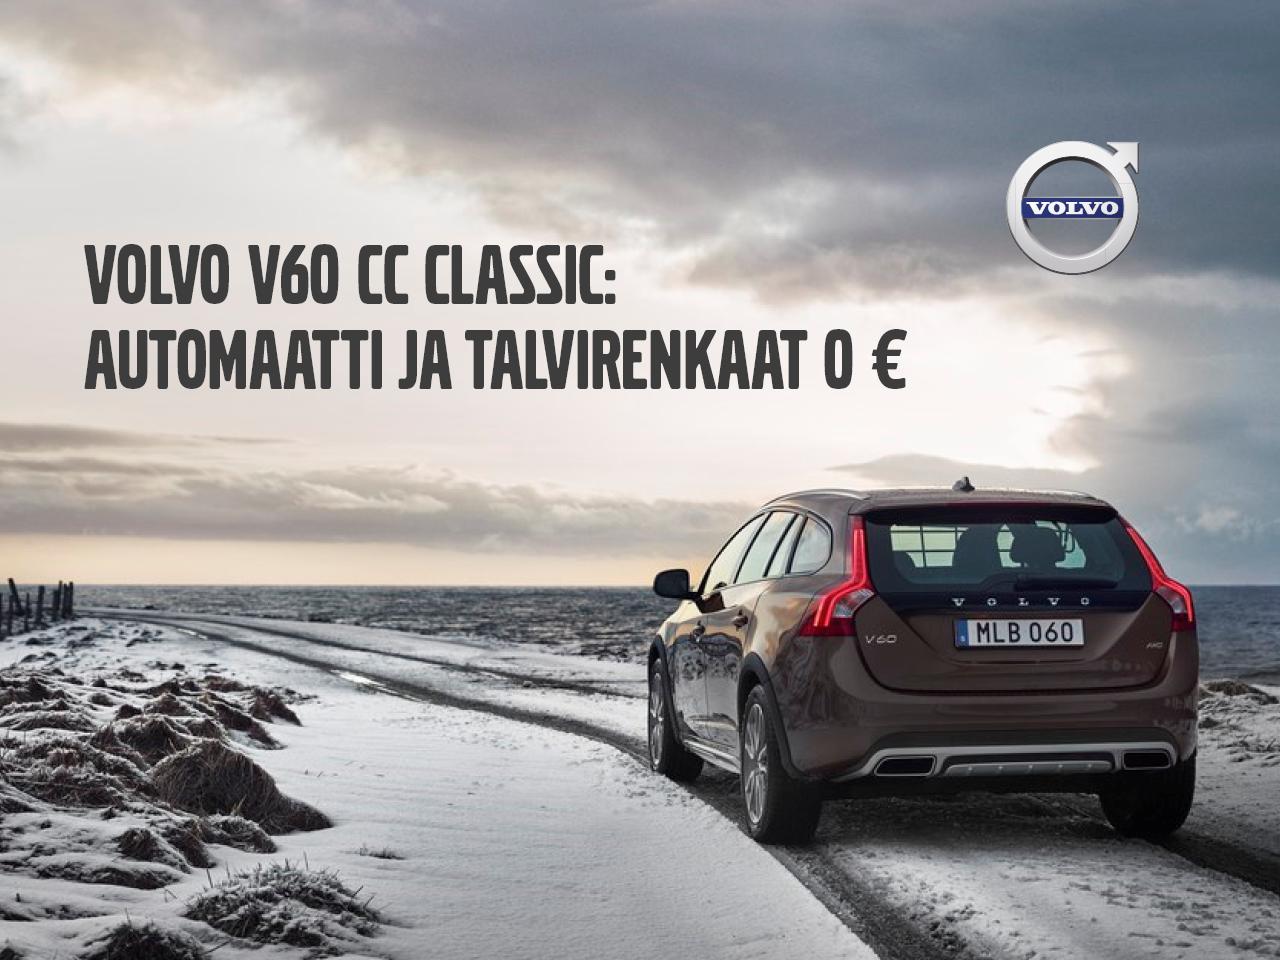 Huippuedut Volvo V60 CC Classic -malliin